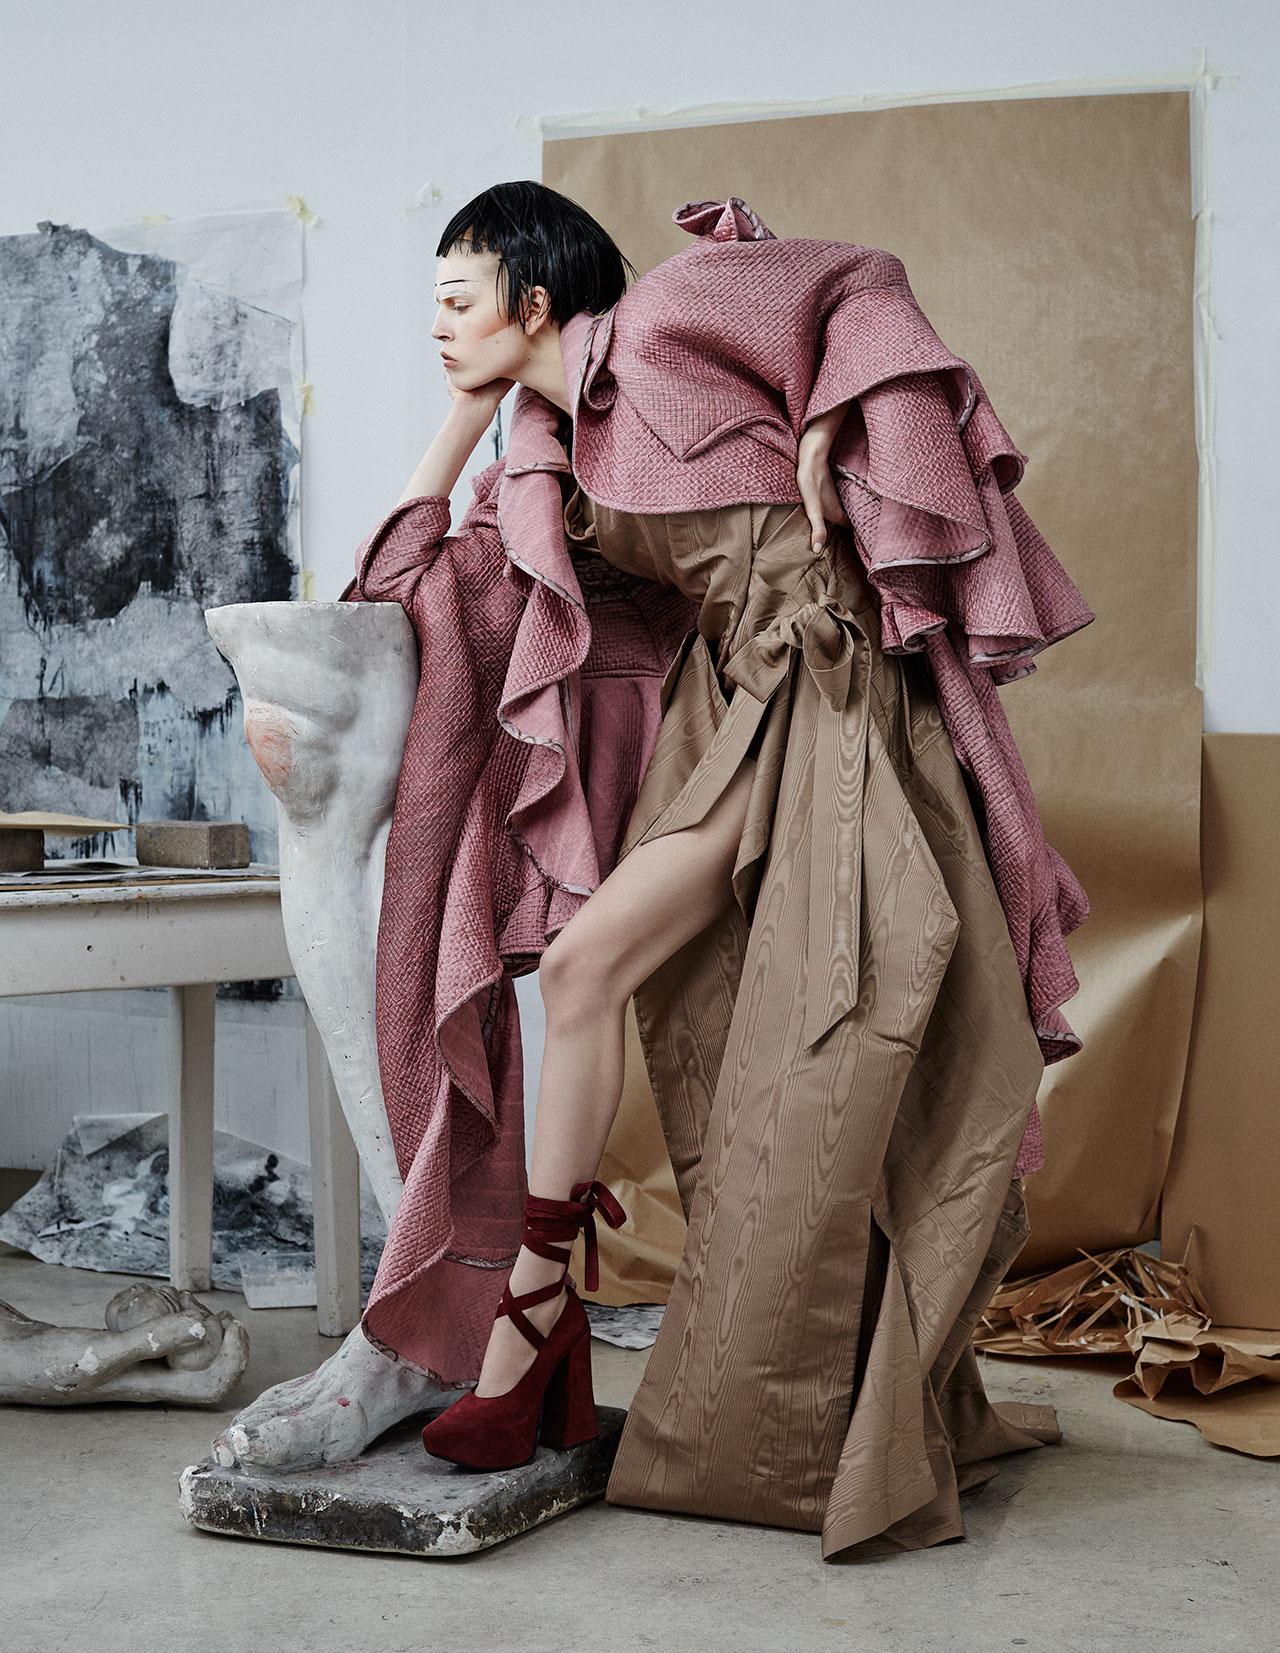 Vivienne Westwood FW 15-16, Photography René Habermacher, Story fashion editor / Curator Filep Motwary. © Modemuseum Hasselt.